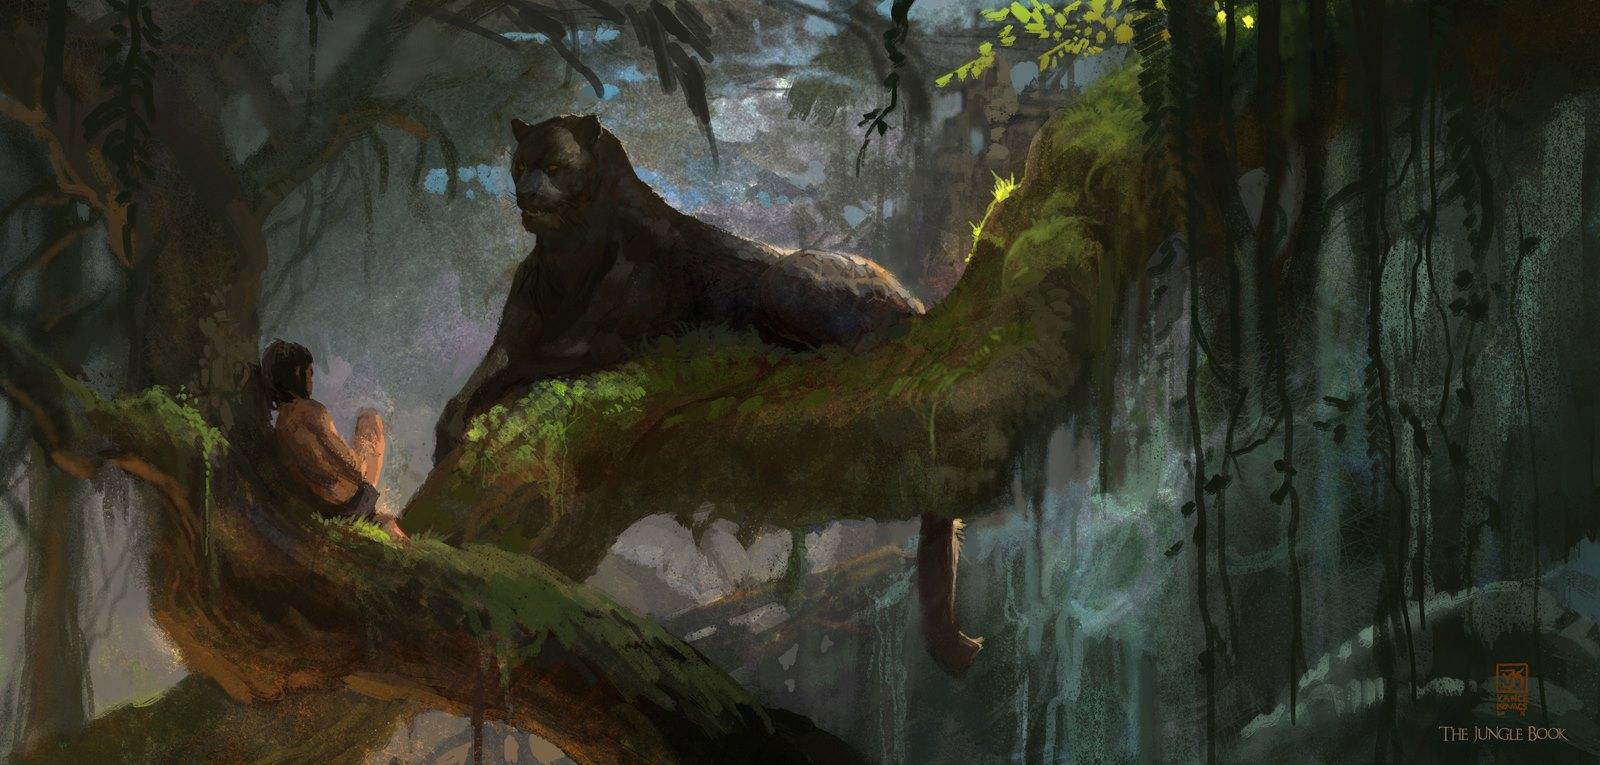 The Jungle Book Concept Art By Vance Kovacs Concept Art